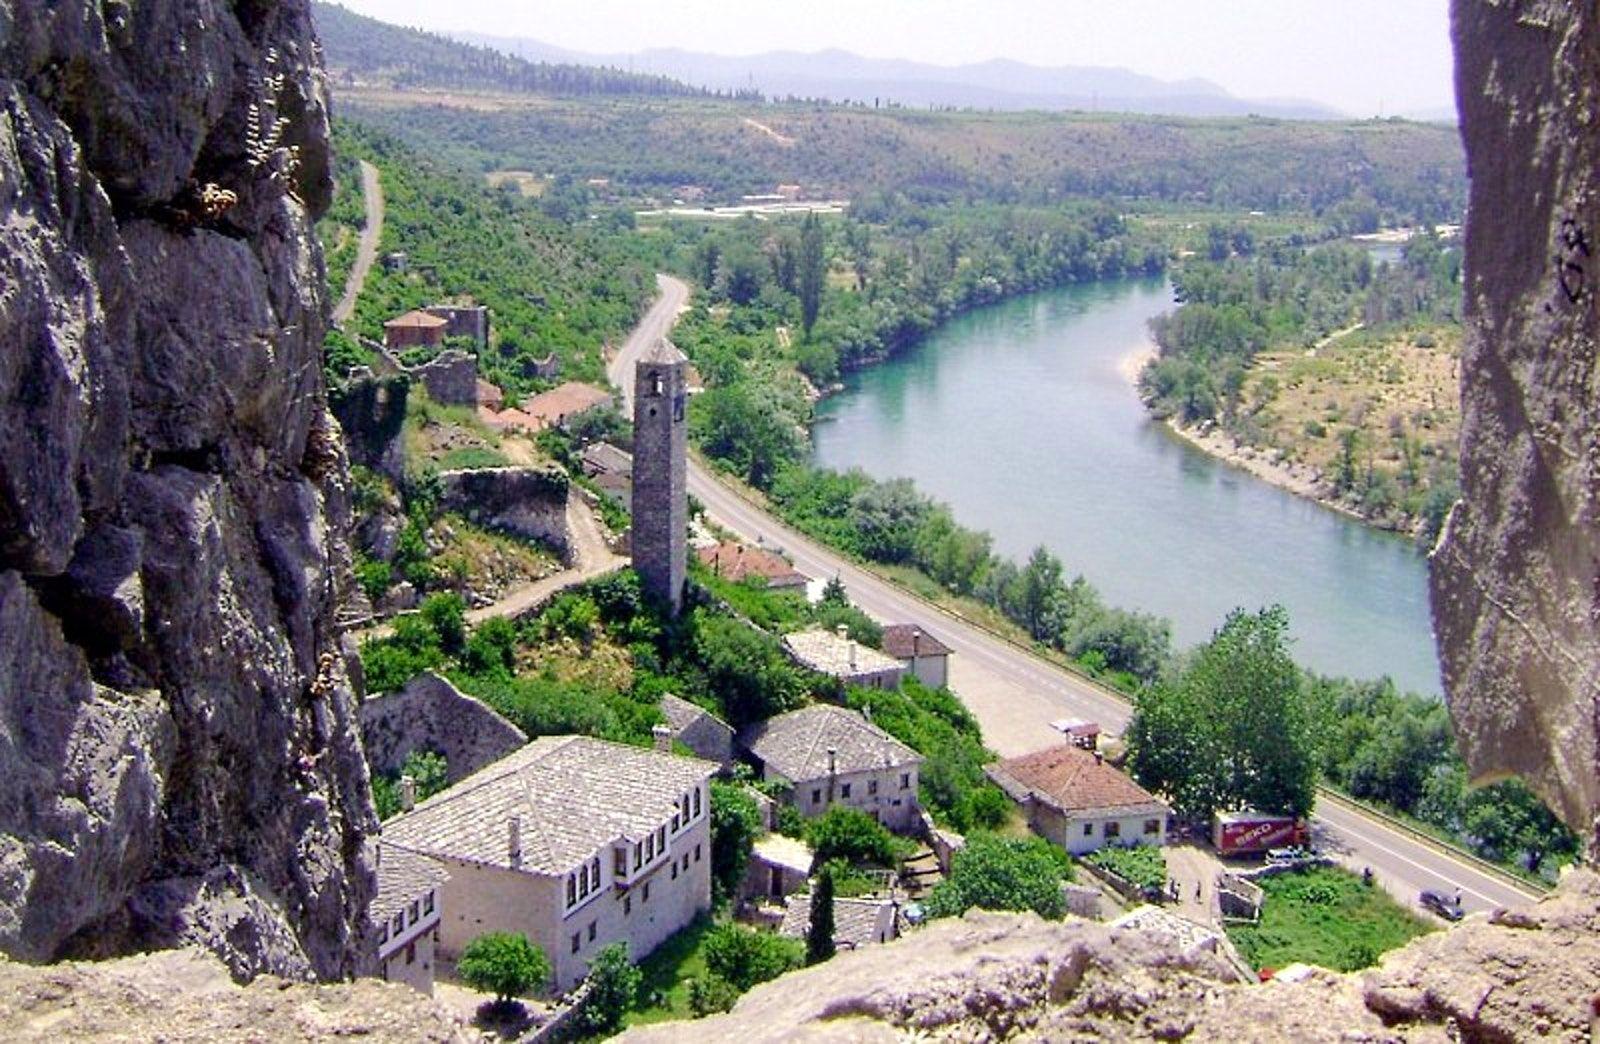 Jablanica în Doboj cu trenul